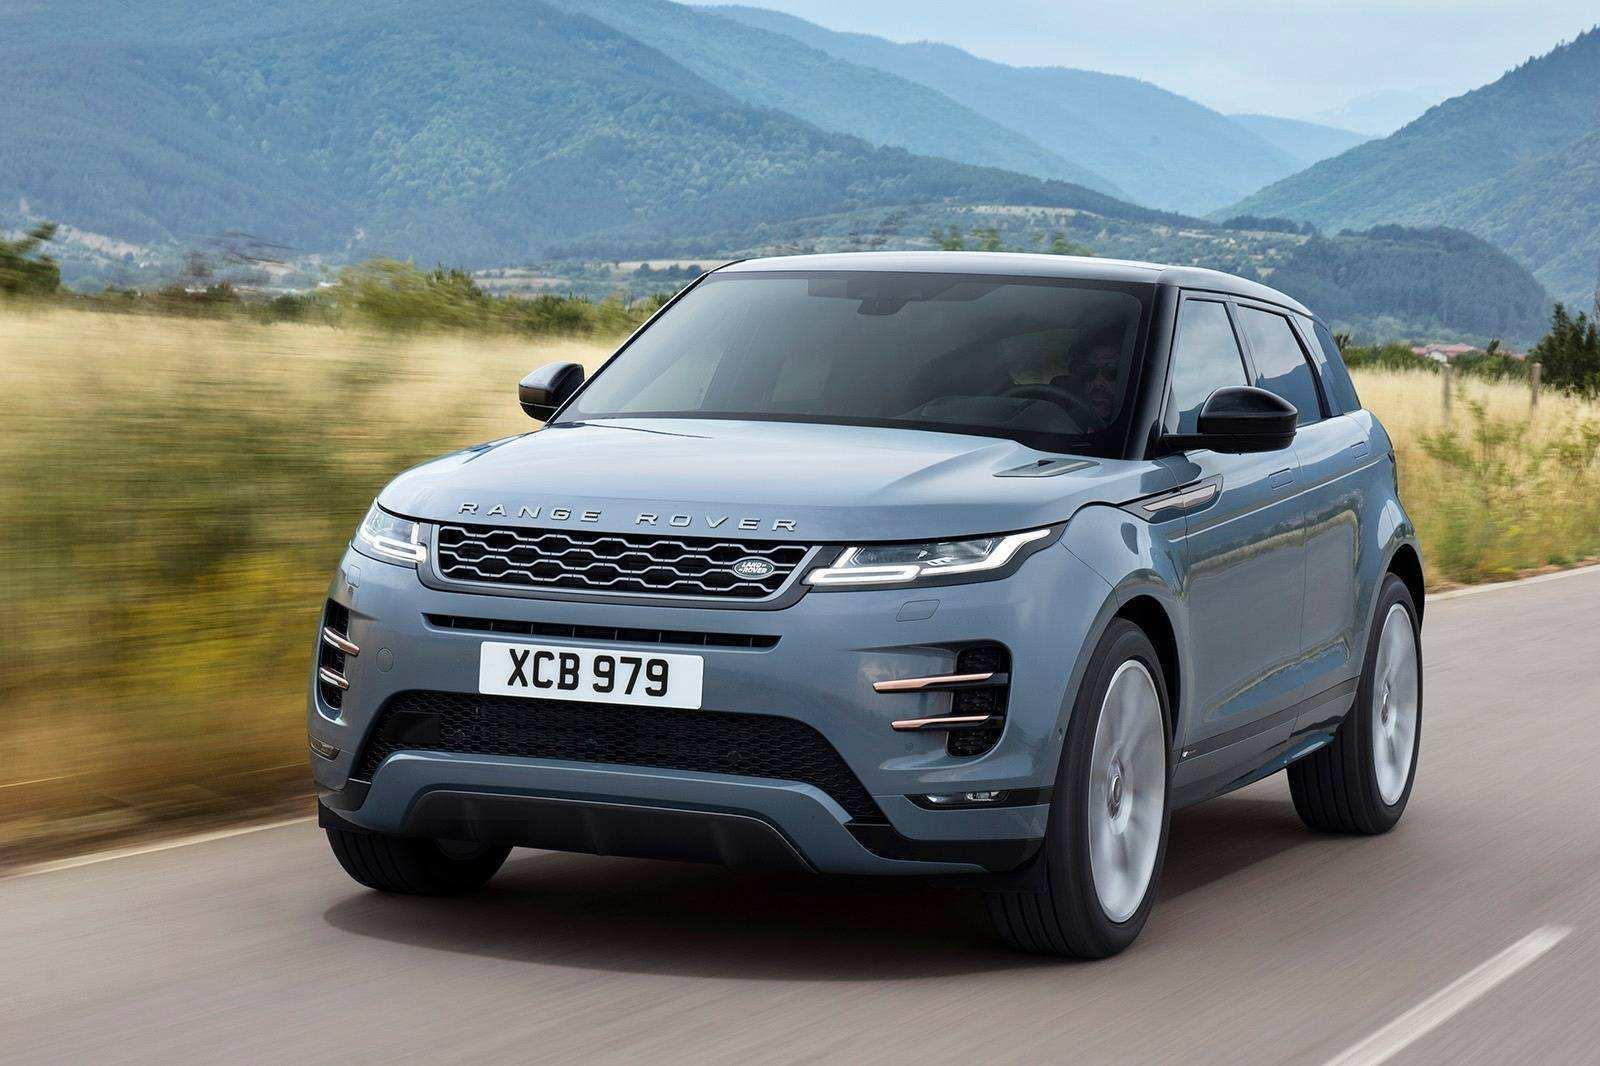 93 Best Review Jaguar Land Rover 2020 Vision Redesign by Jaguar Land Rover 2020 Vision